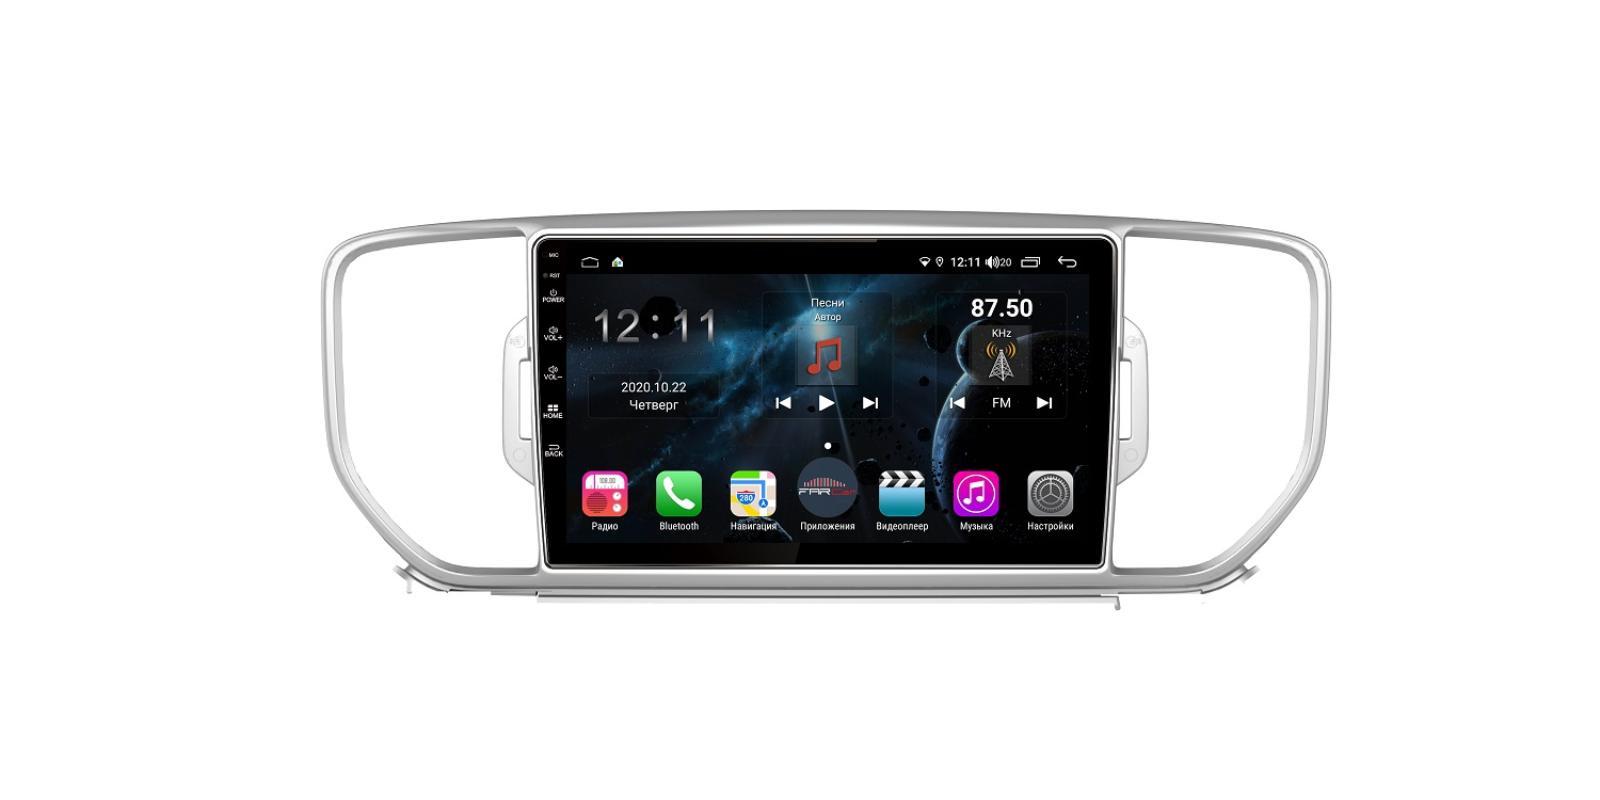 Штатная магнитола FarCar s400 для KIA Sportage на Android (H576R) (+ Камера заднего вида в подарок!)